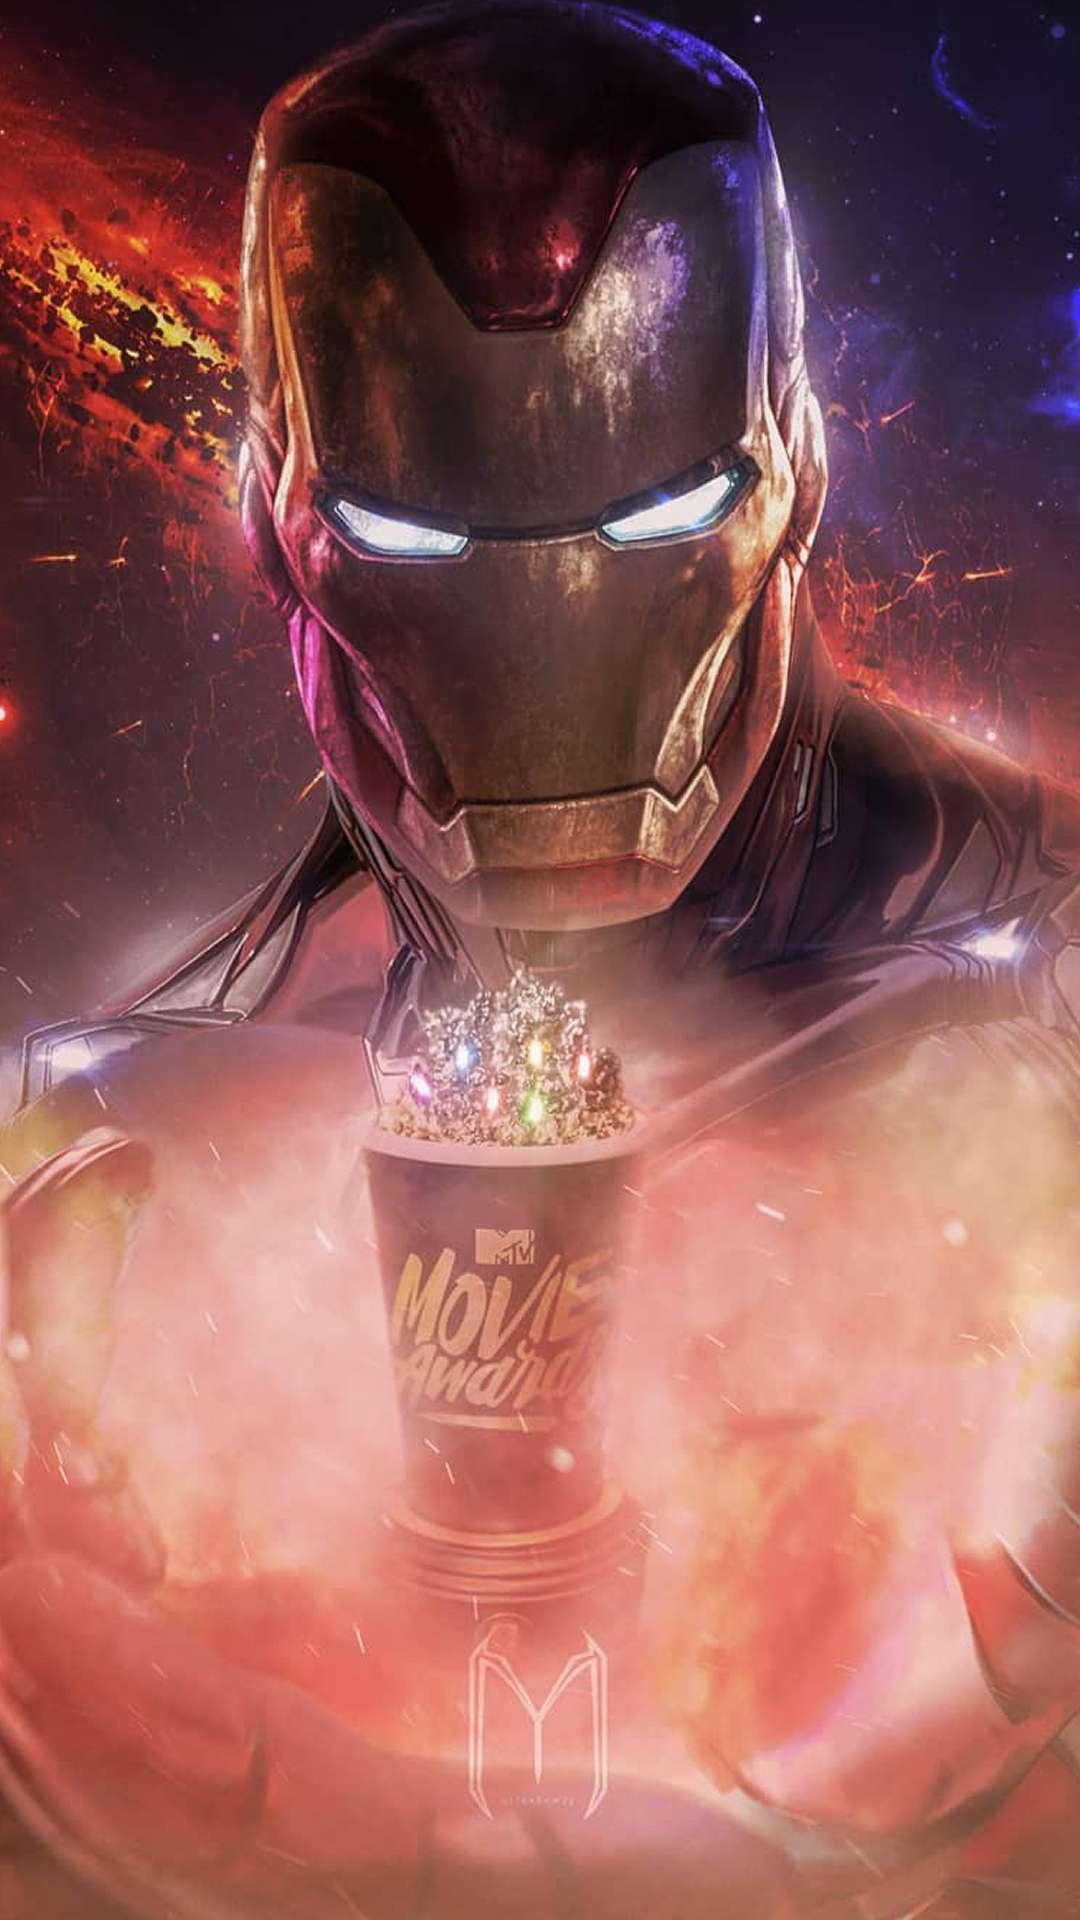 The Iron Man Mark 85 iPhone Wallpaper